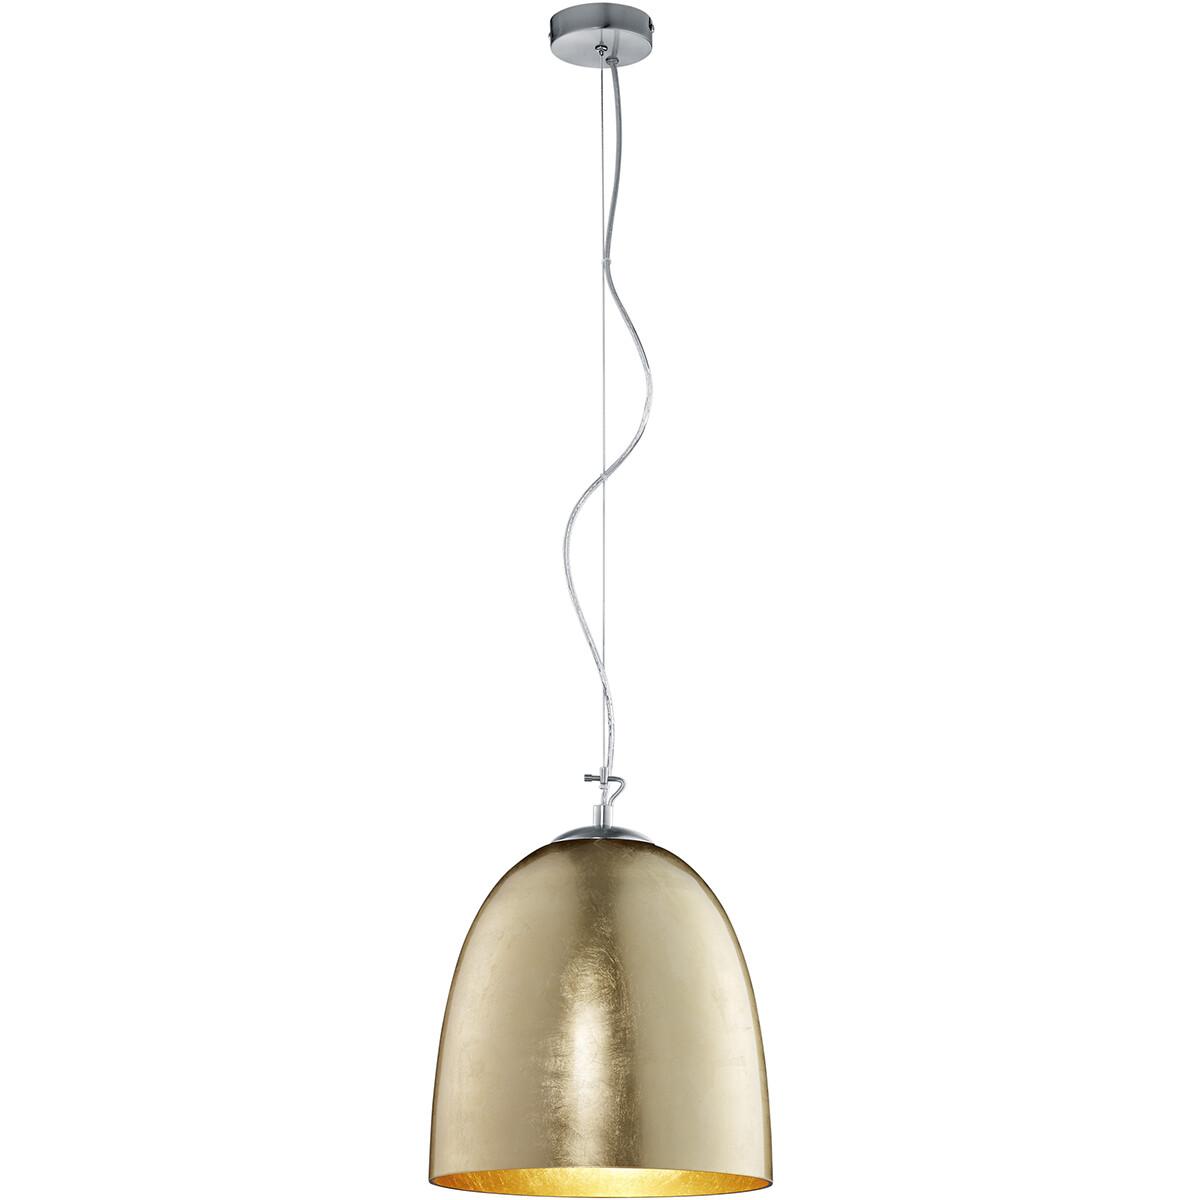 LED Hanglamp - Hangverlichting - Trion Onutia XL - E27 Fitting - 1-lichts - Ovaal - Mat Goud - Alumi